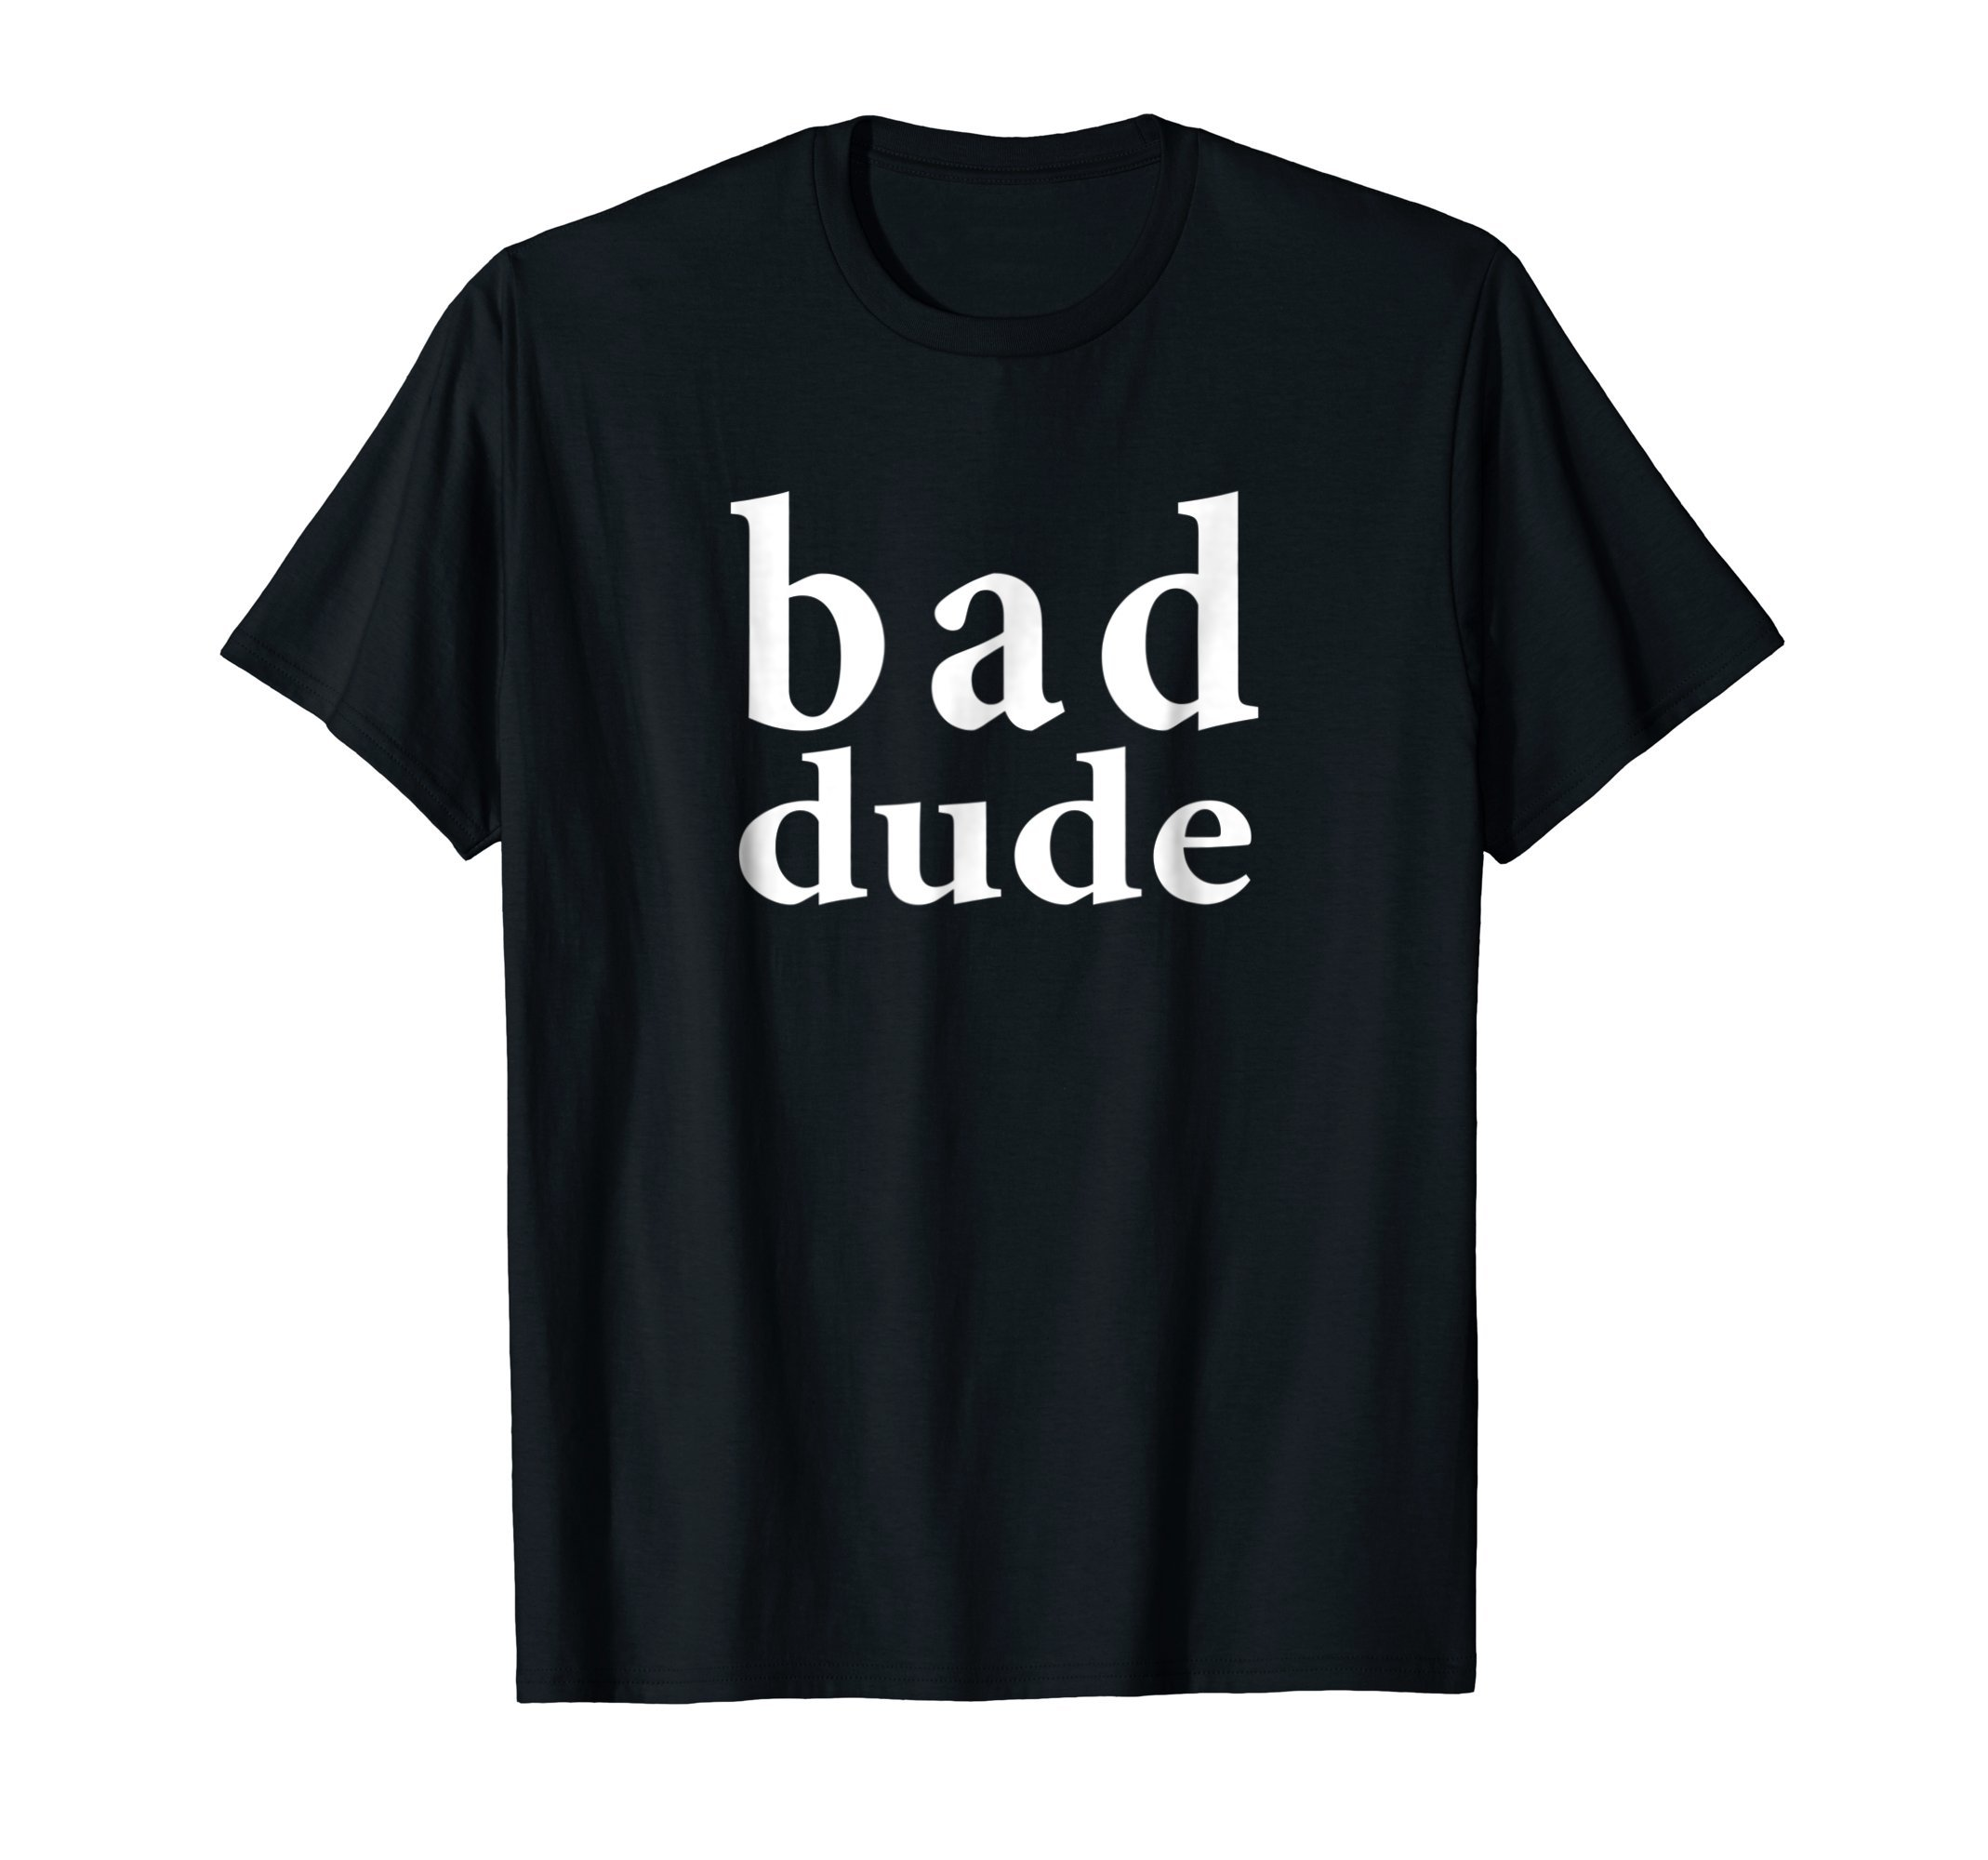 Bad Dude Funny T-Shirt for Travel Ban Protestors